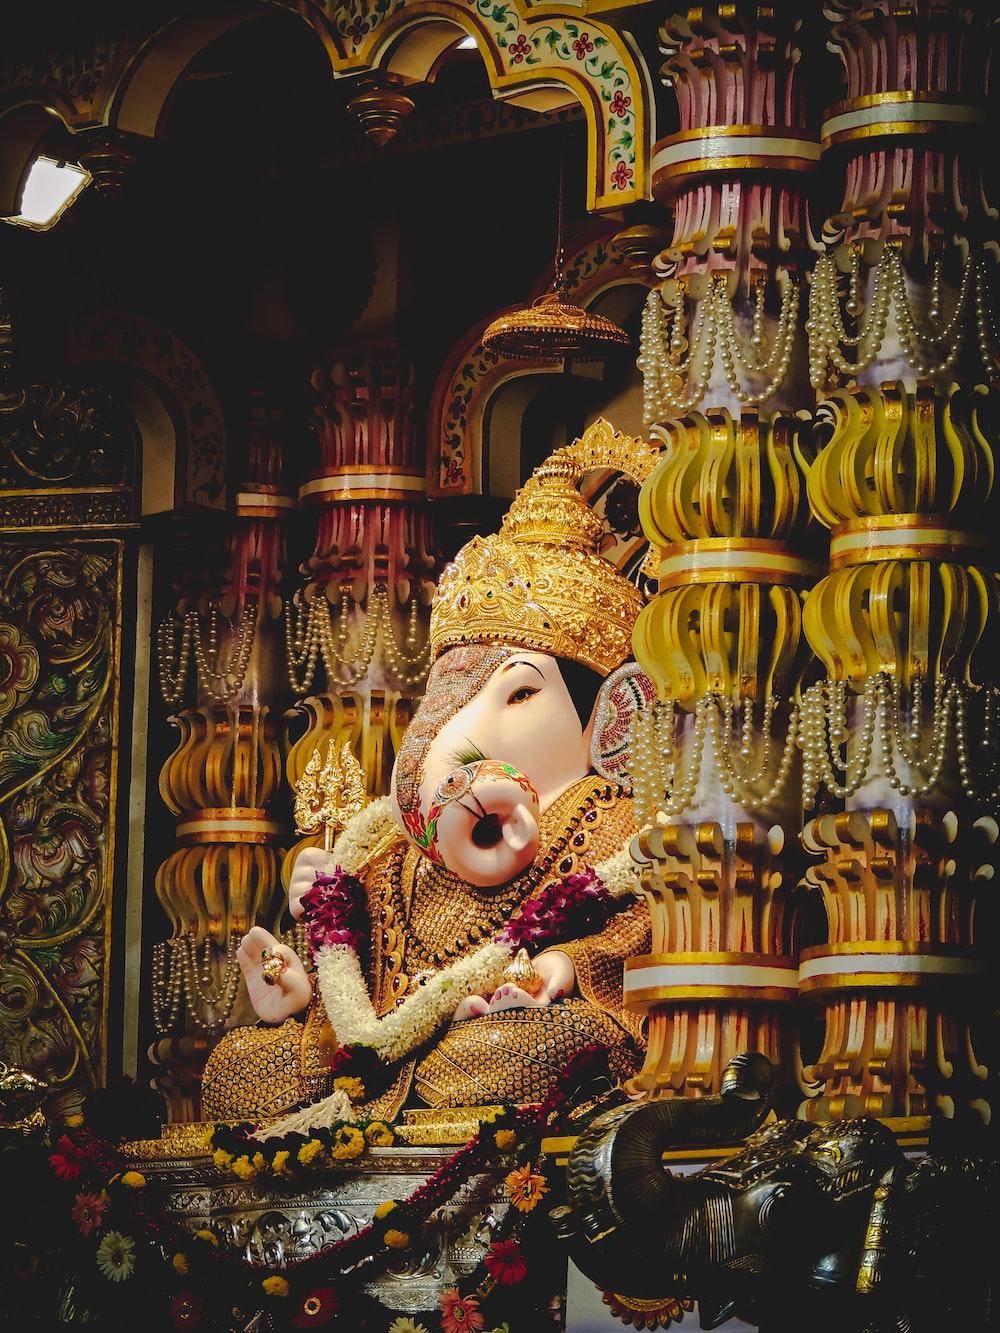 Lord Ganesha figurine